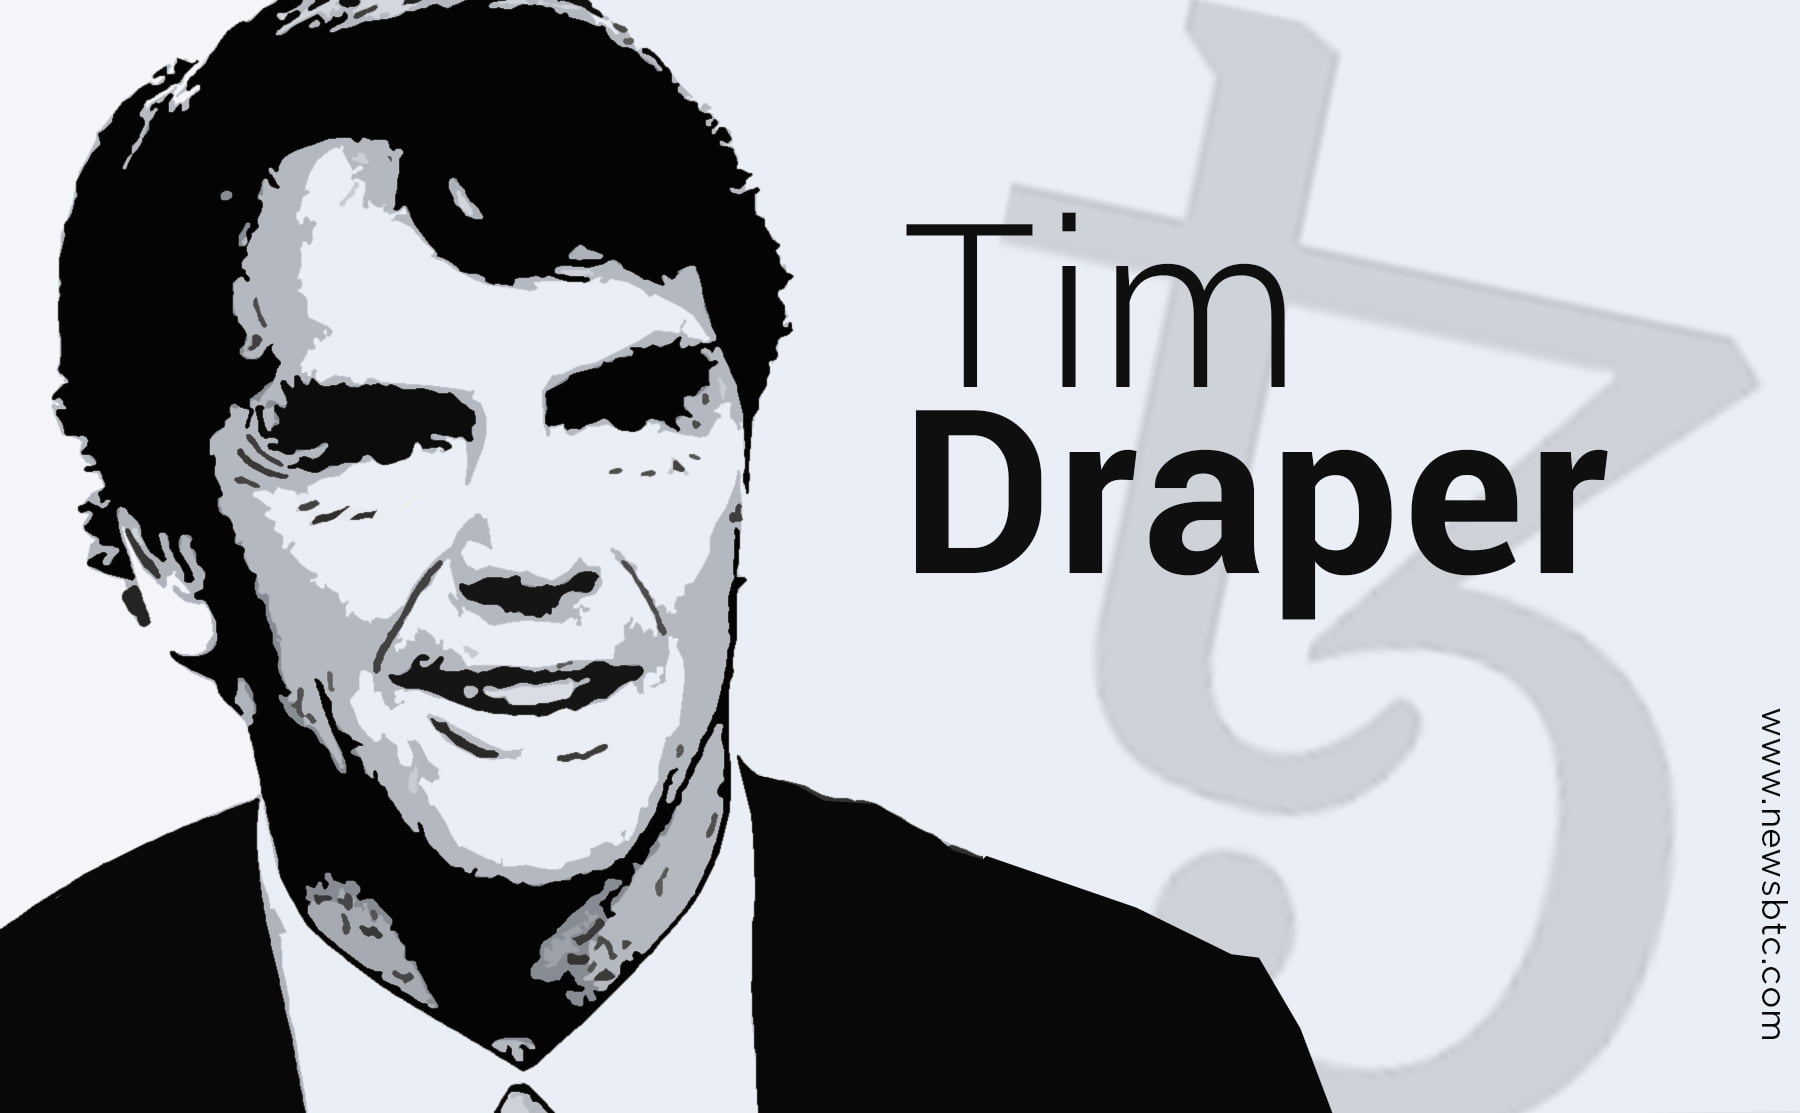 Tim Draper ICO